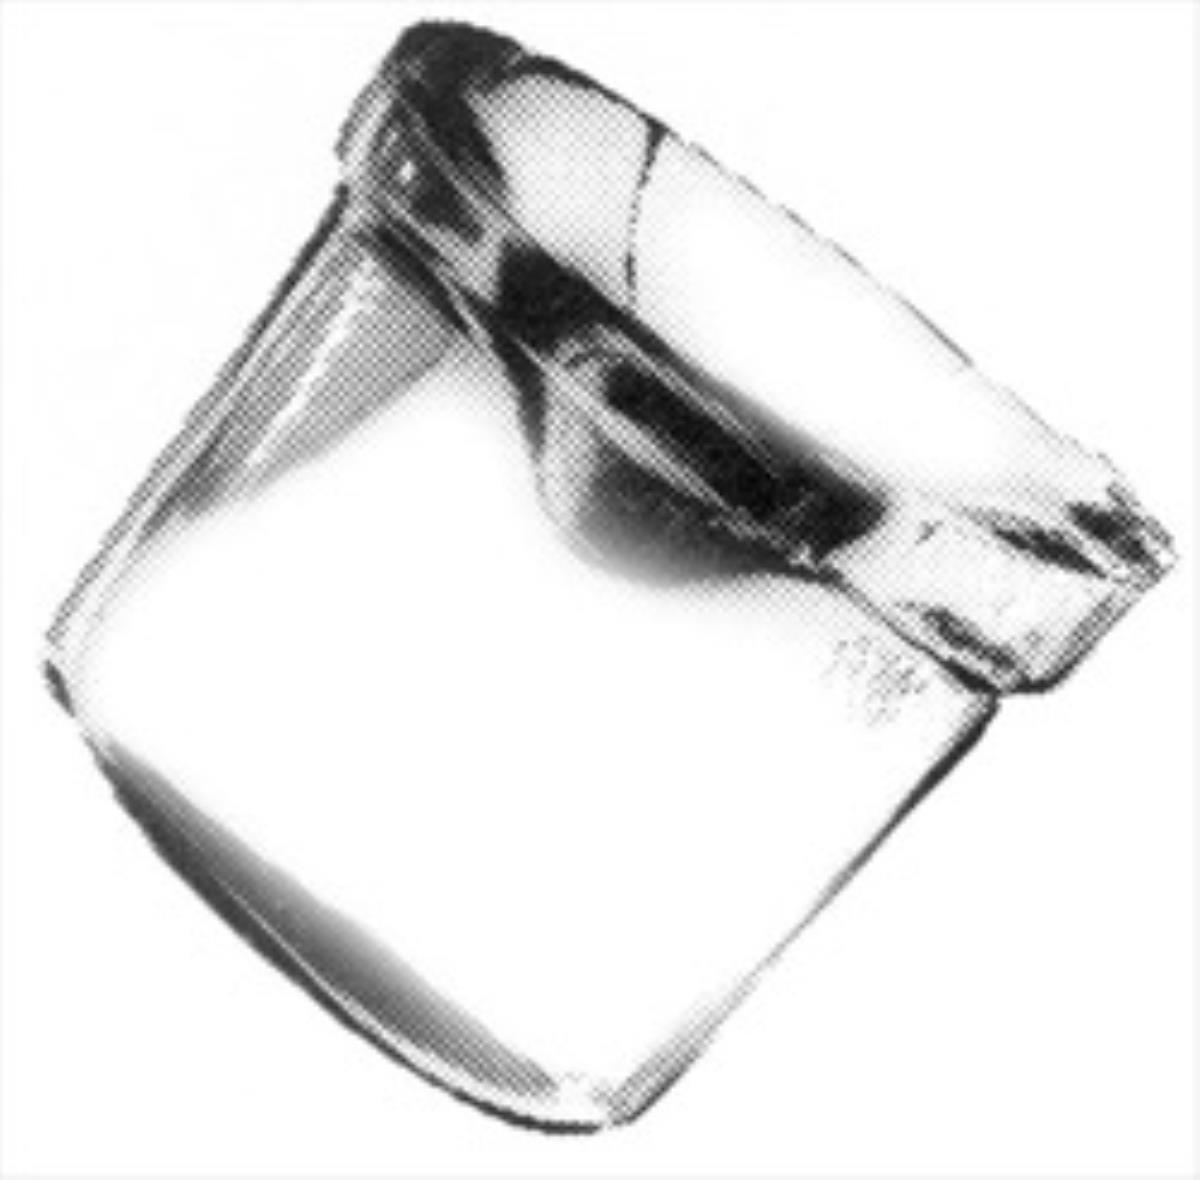 Image of Scotsman CU50GA-1A's clear ice